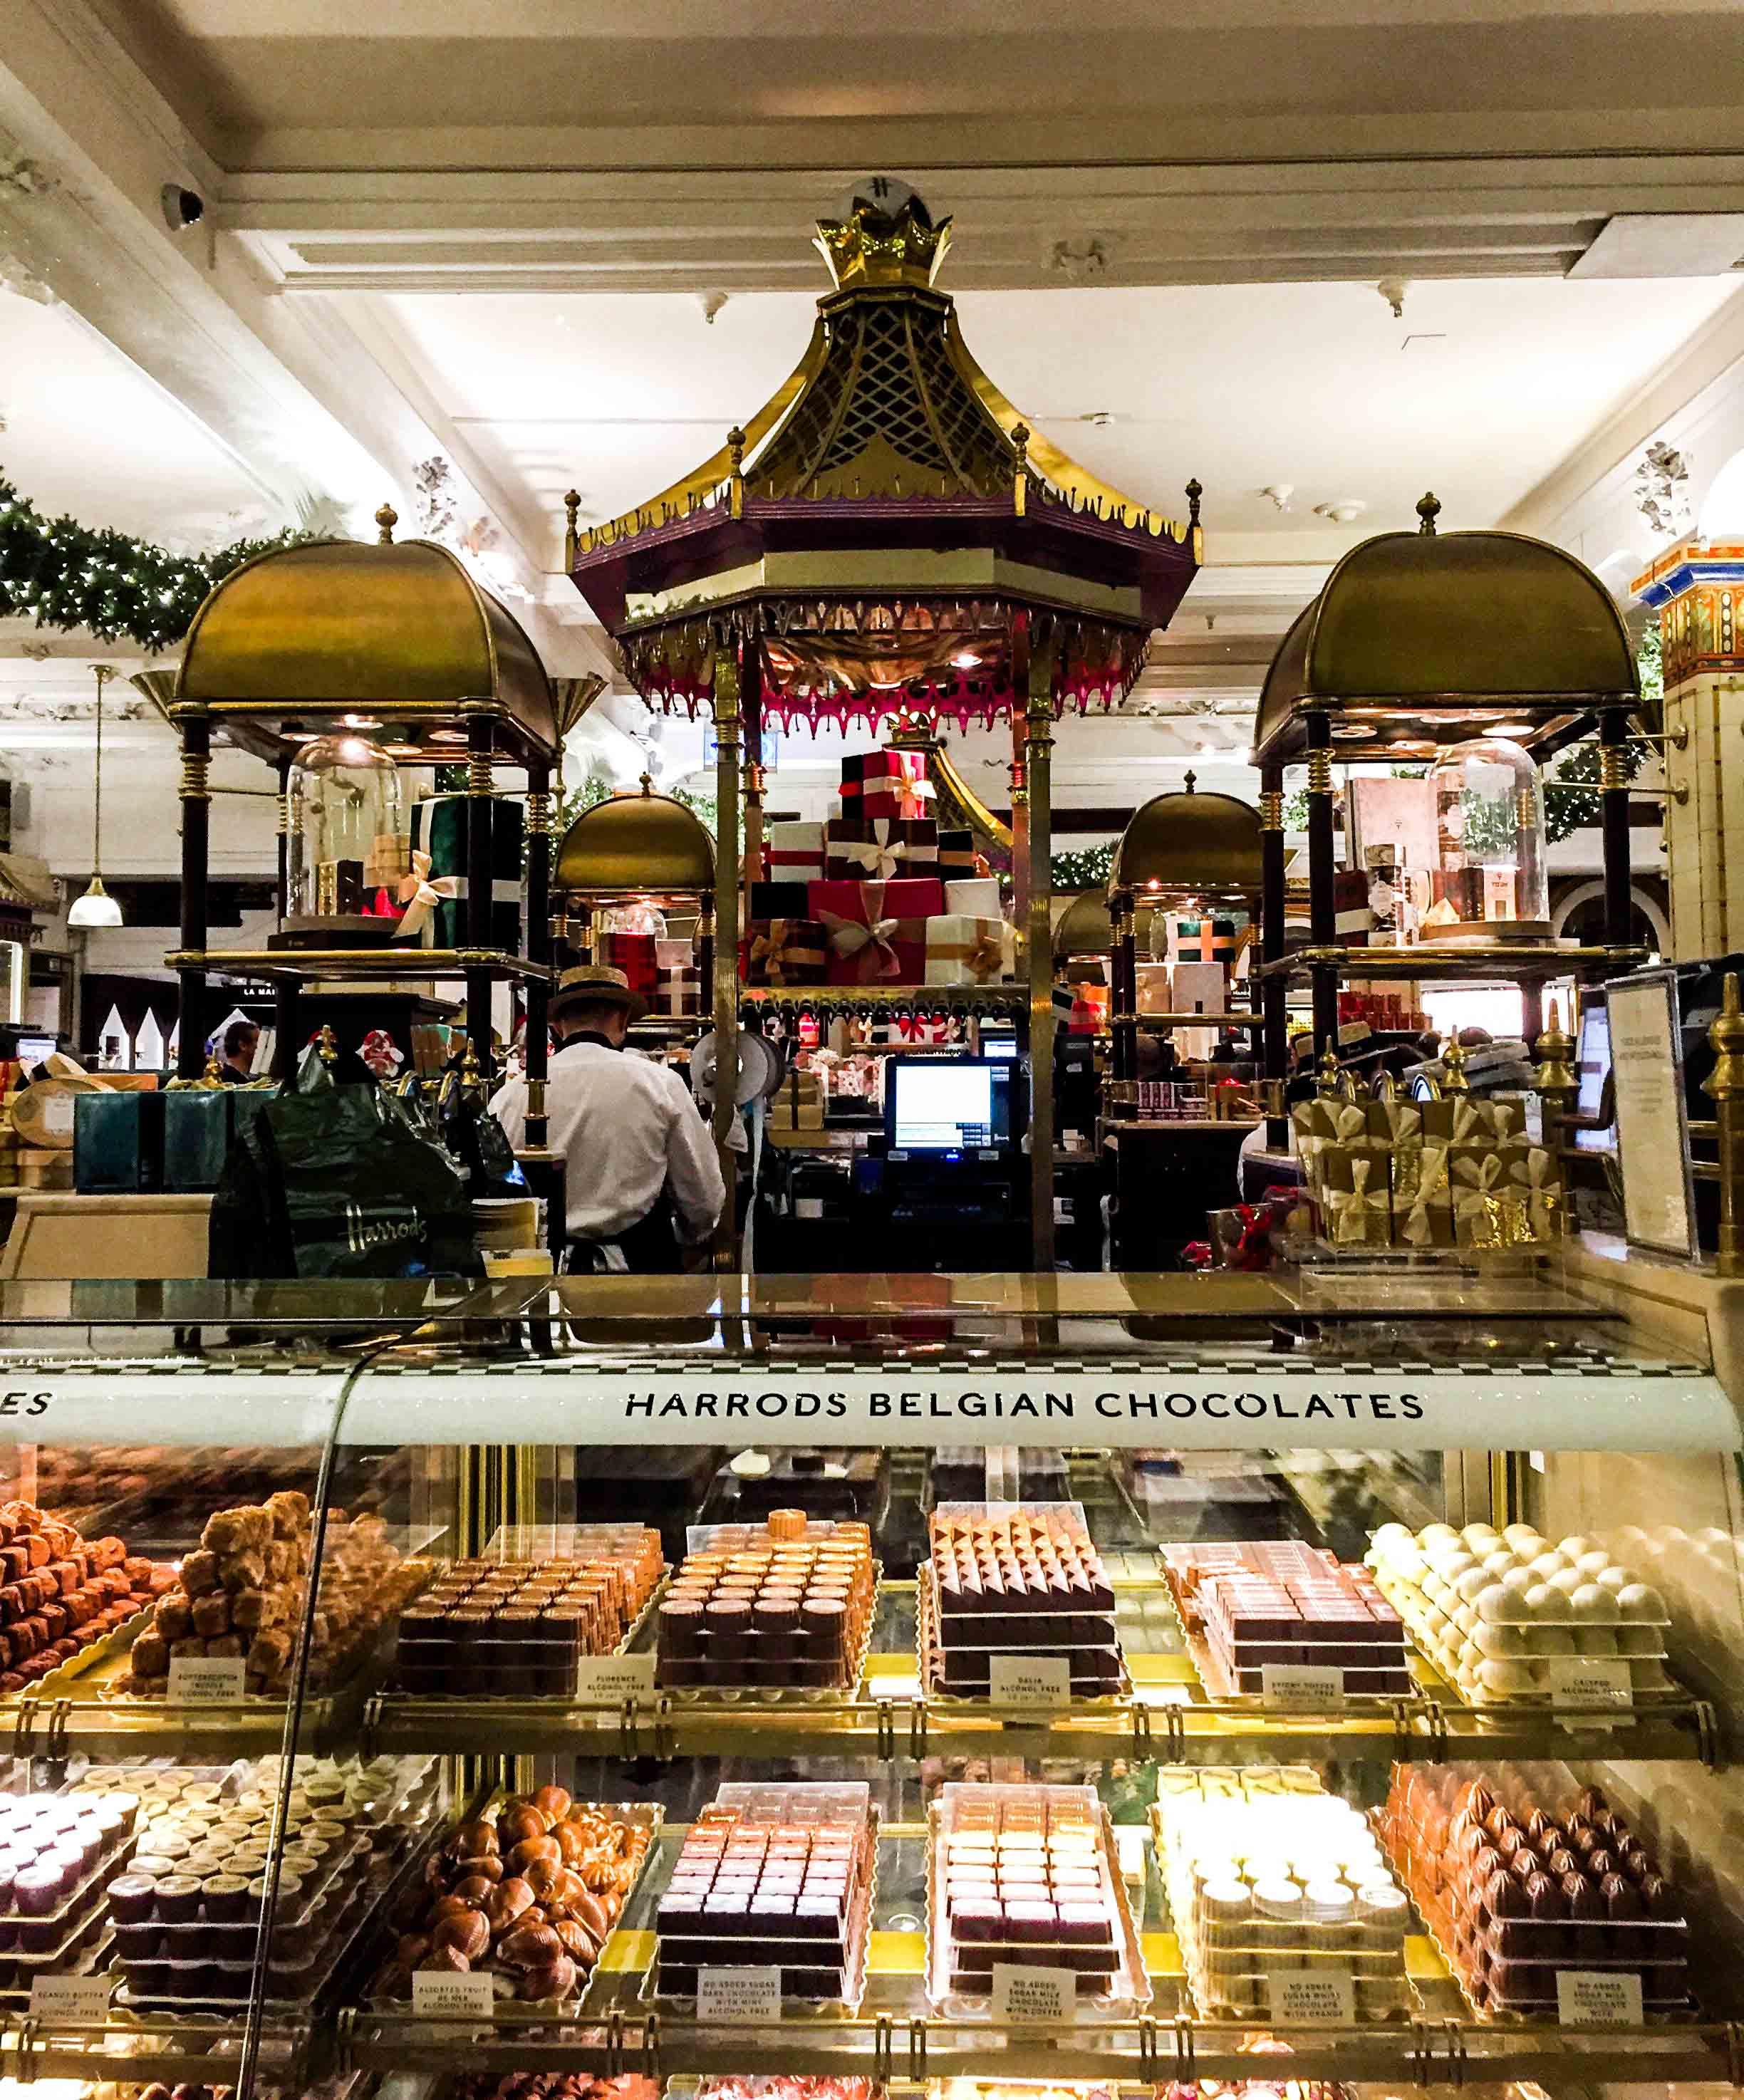 Harrods Belgian chocolates inside the Harrods food court, London.